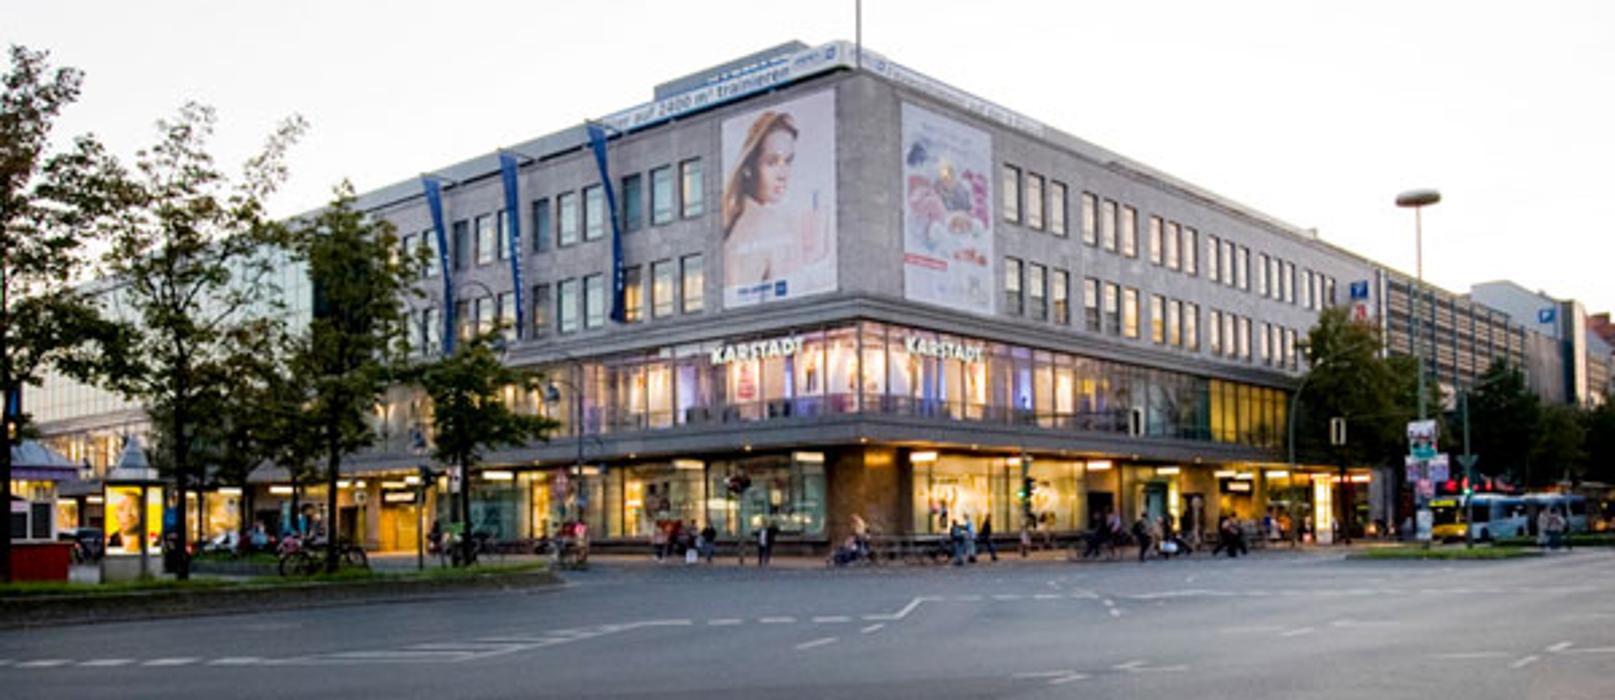 Karstadt Berlin Hermannplatz Kreuzberg, Hermannplatz in Berlin